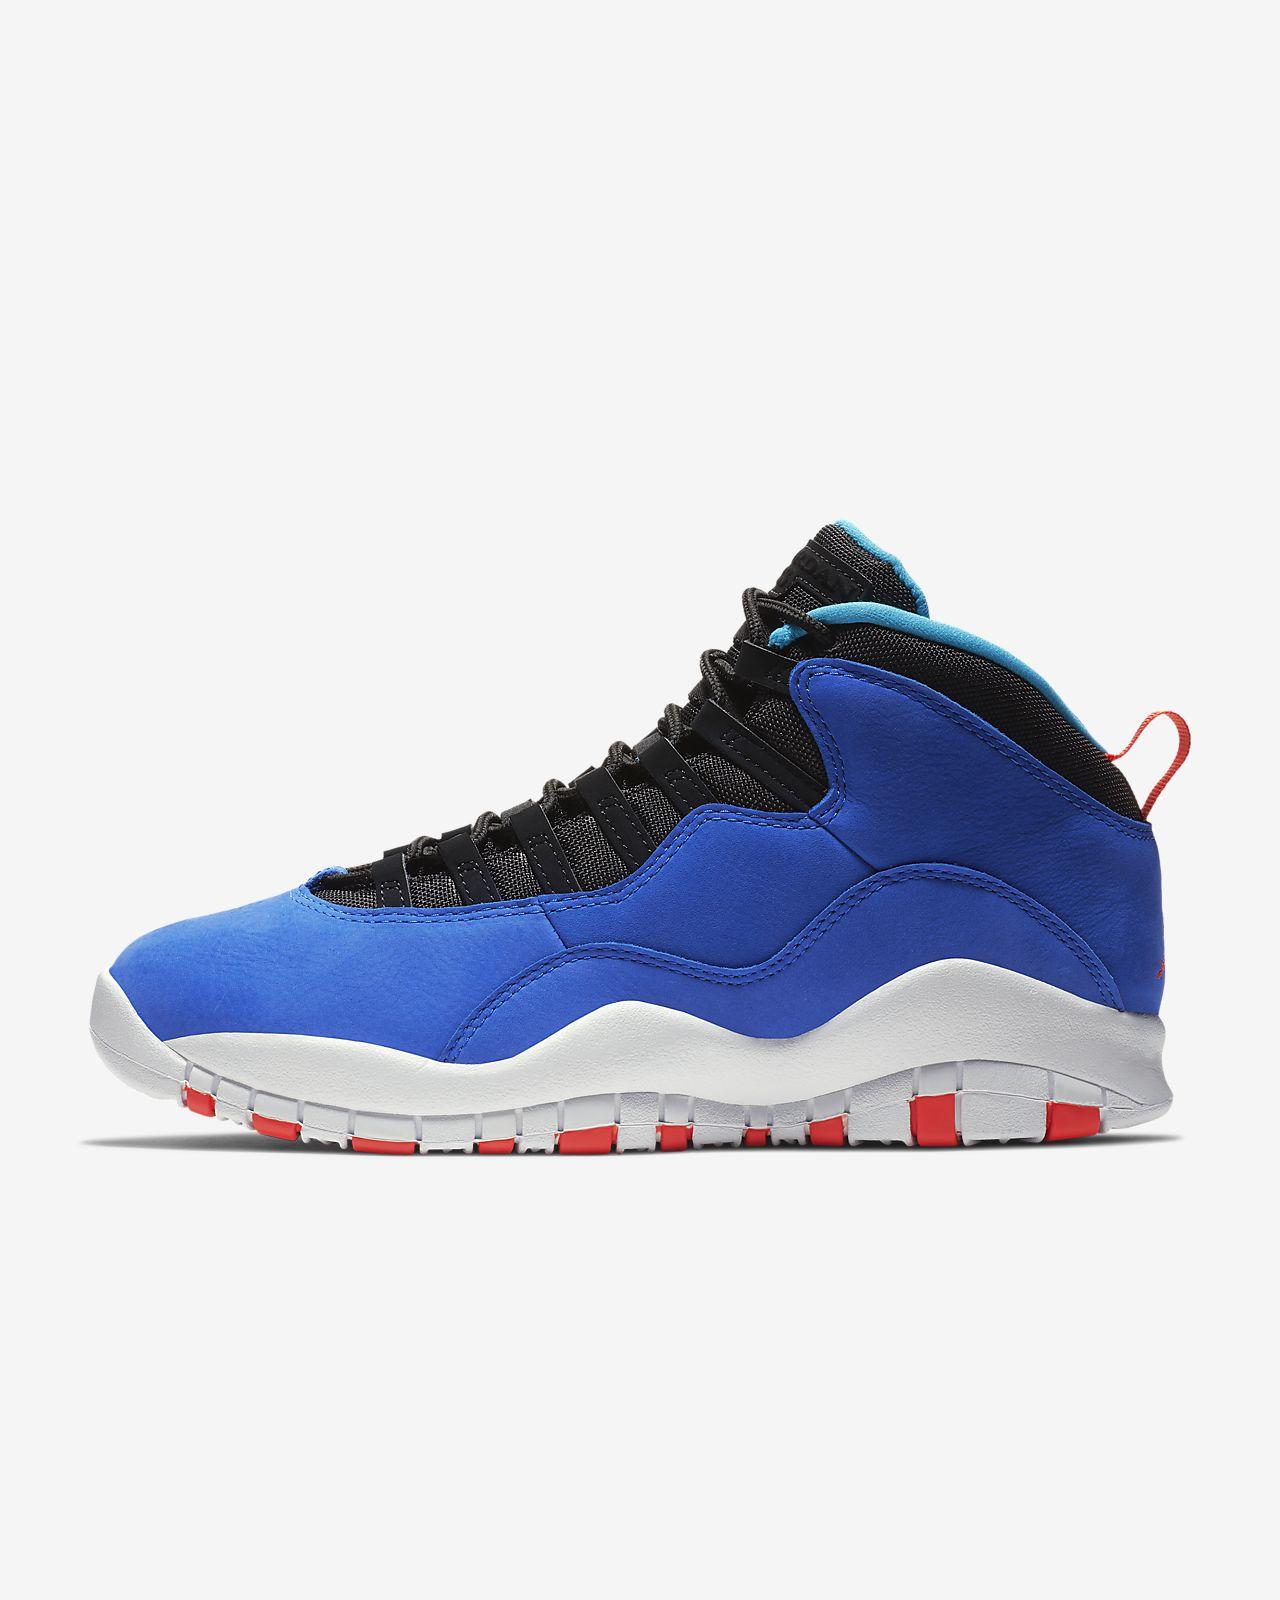 94359397d0c Air Jordan 10 Retro Men s Shoe. Nike.com CA